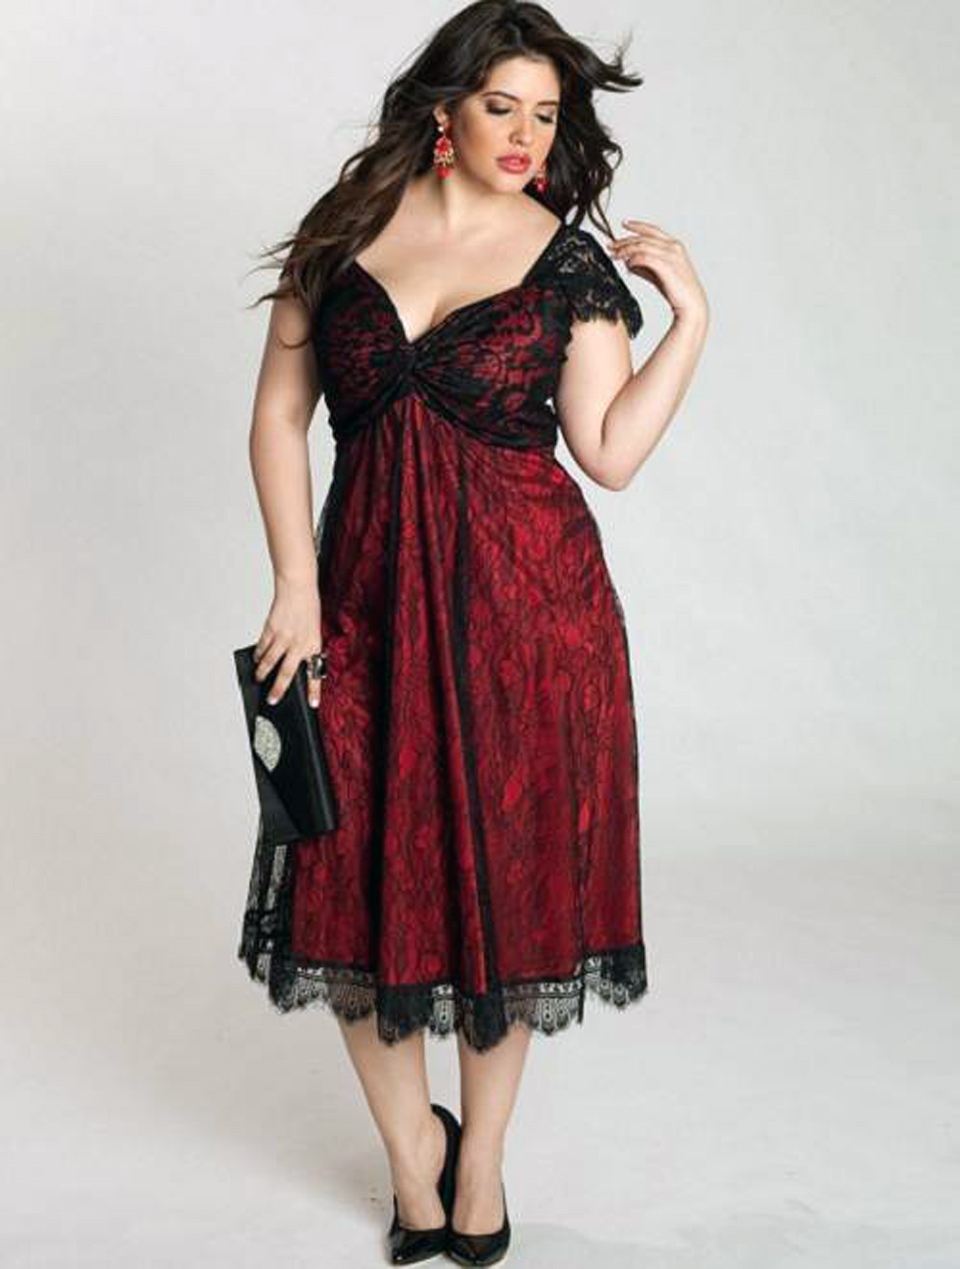 Christmas Dinner Dresses 2019.40 Sexy Plus Size Christmas Party Dresses 2019 Plus Size